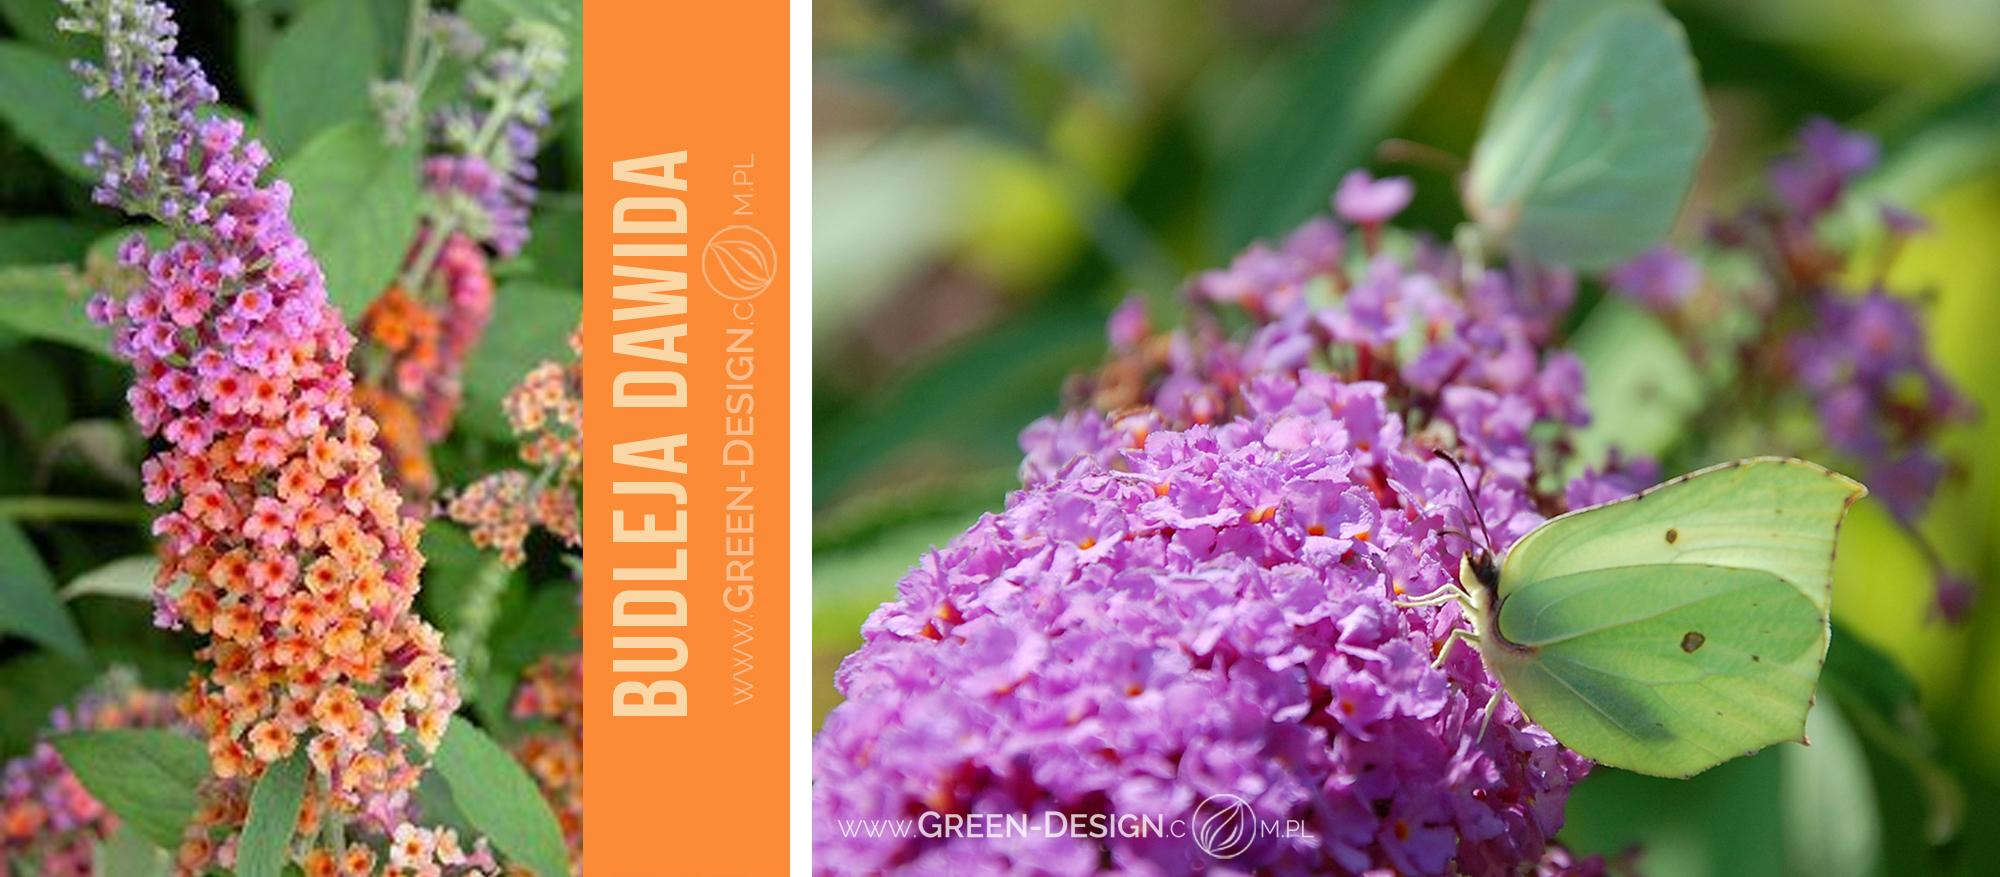 Green-Design-Blog_budleja_cover_photo_1